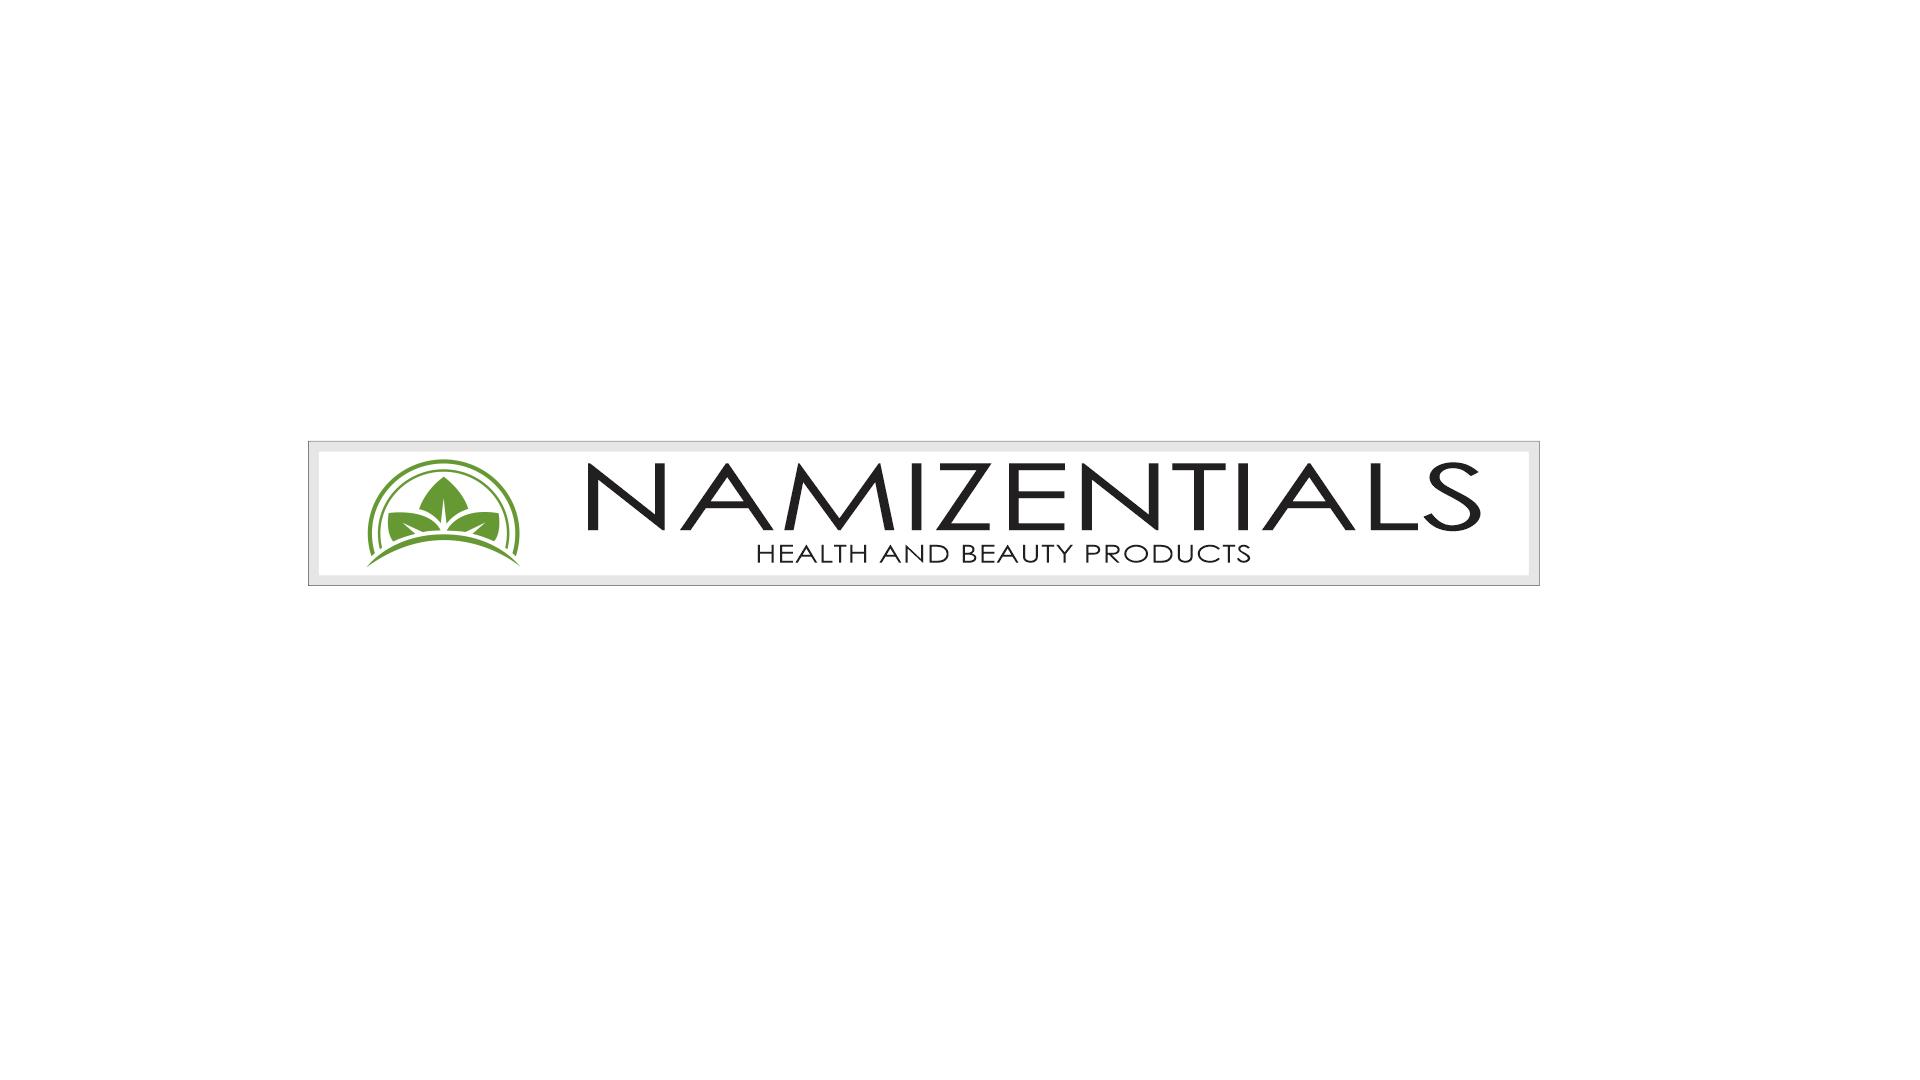 Namizentials